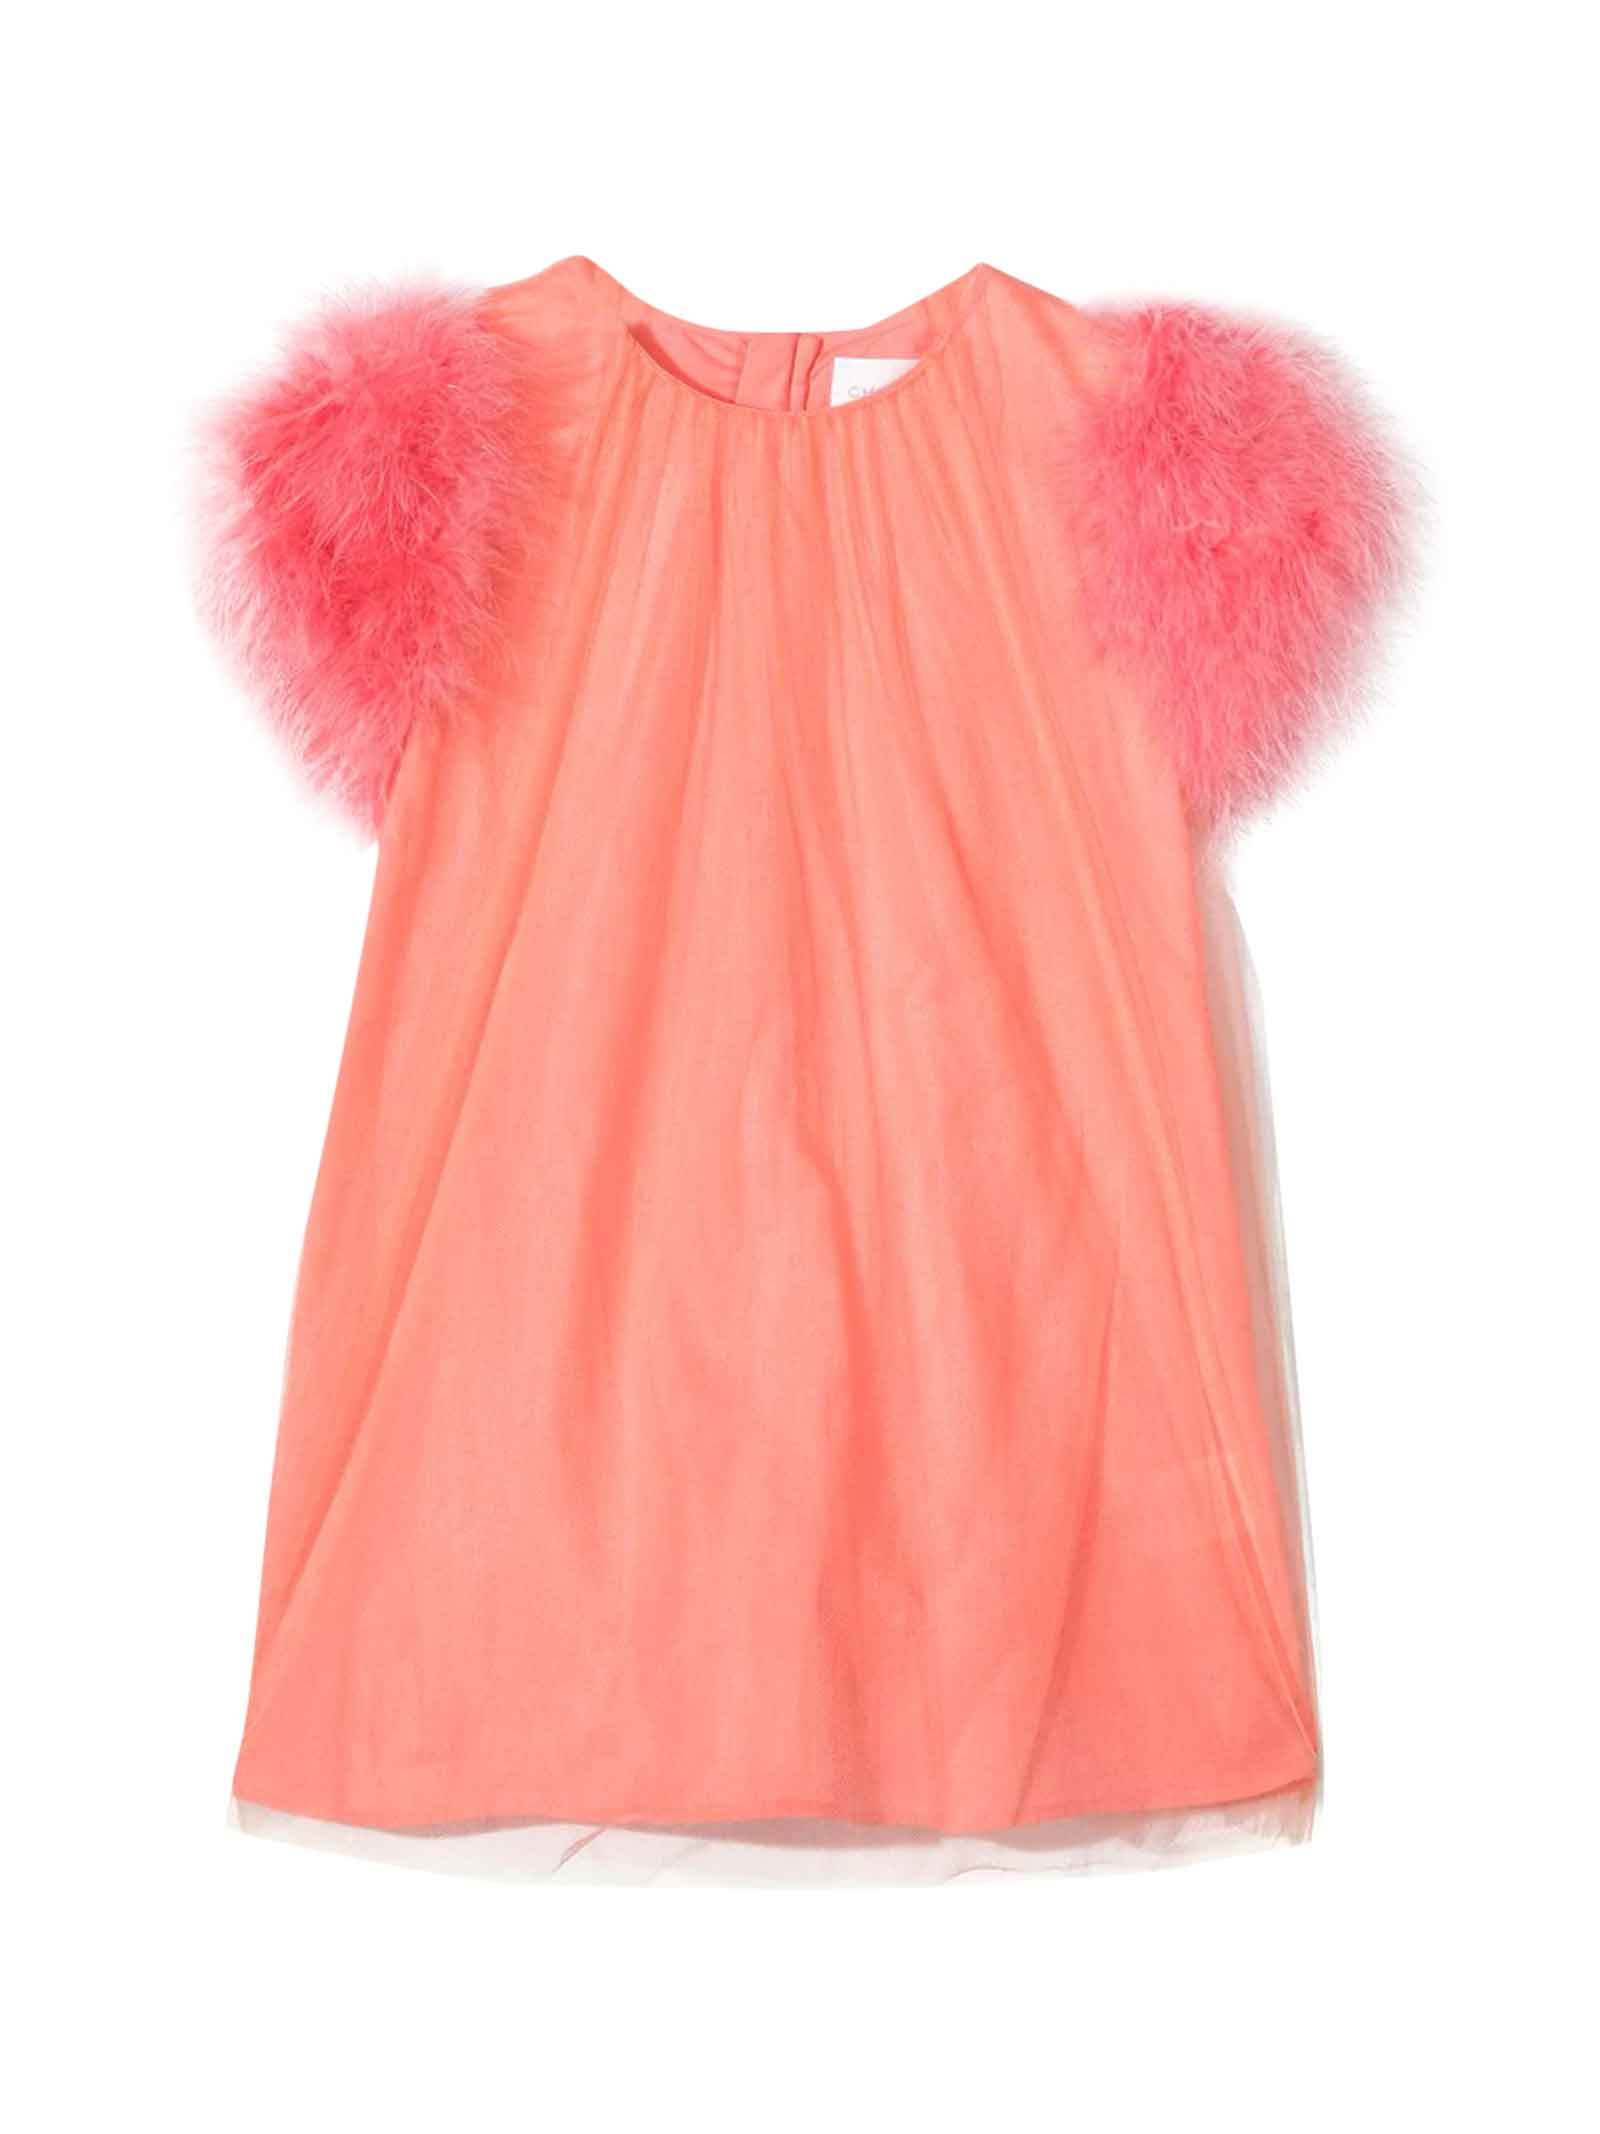 Apricot Dress Kids